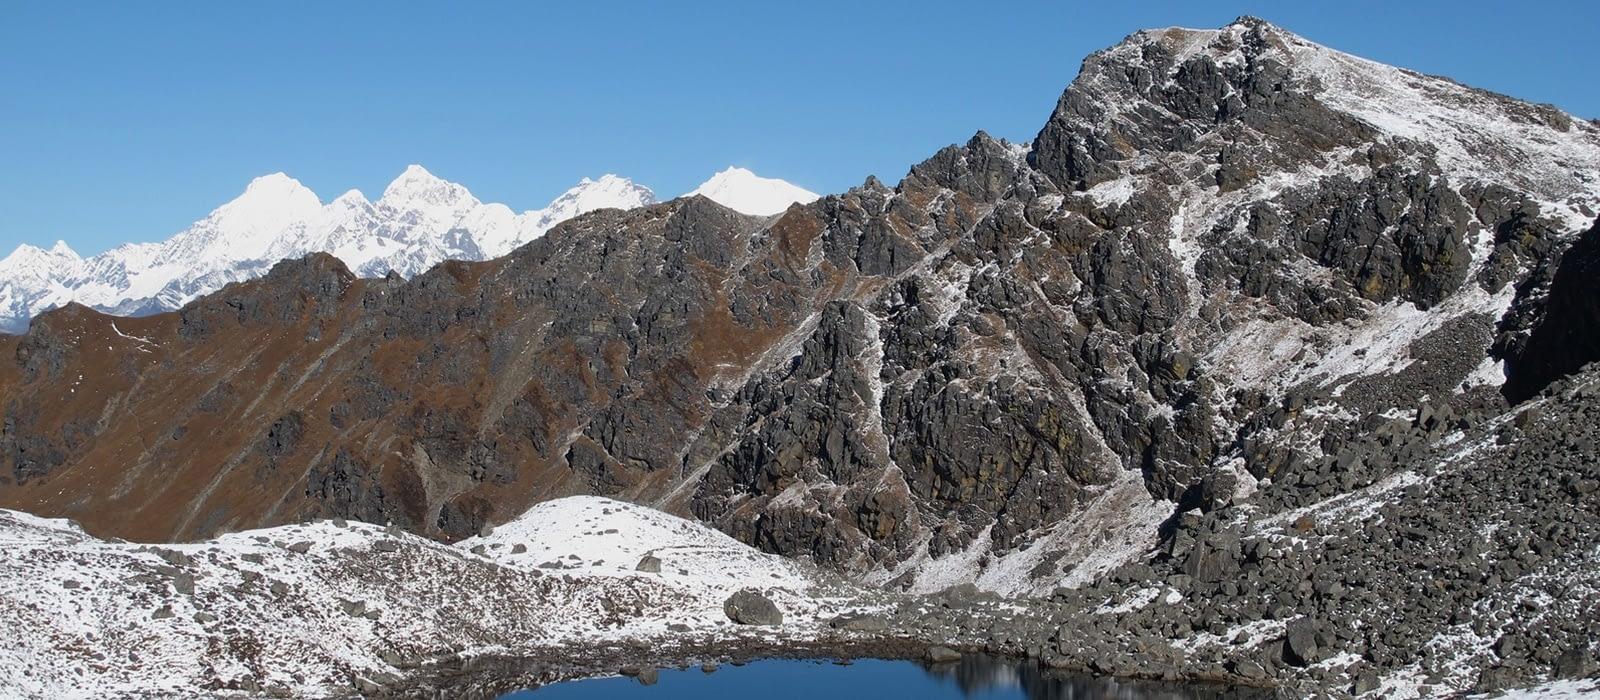 Langtang, Gosainkund and Helambu Trek